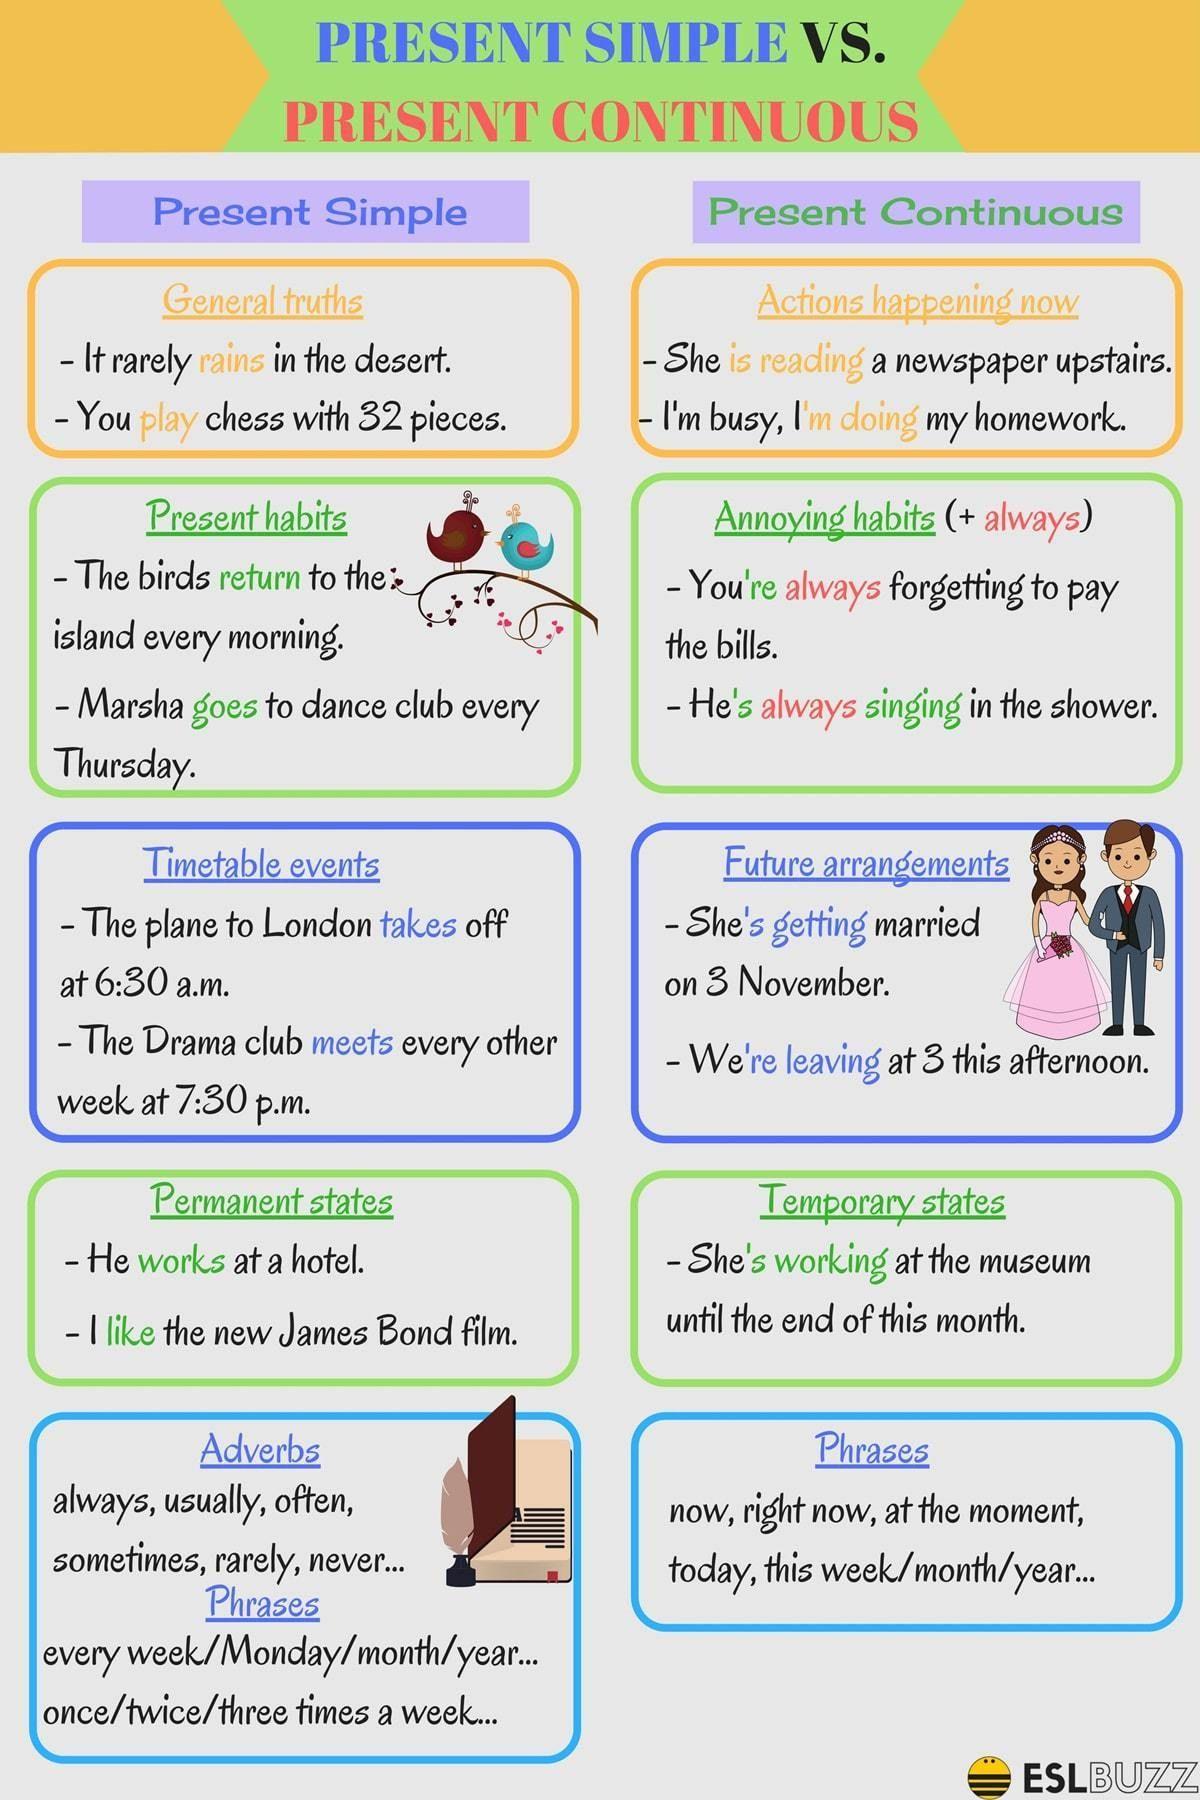 Present Simple Vs Present Continuous English Grammar Tenses Learn English English Grammar